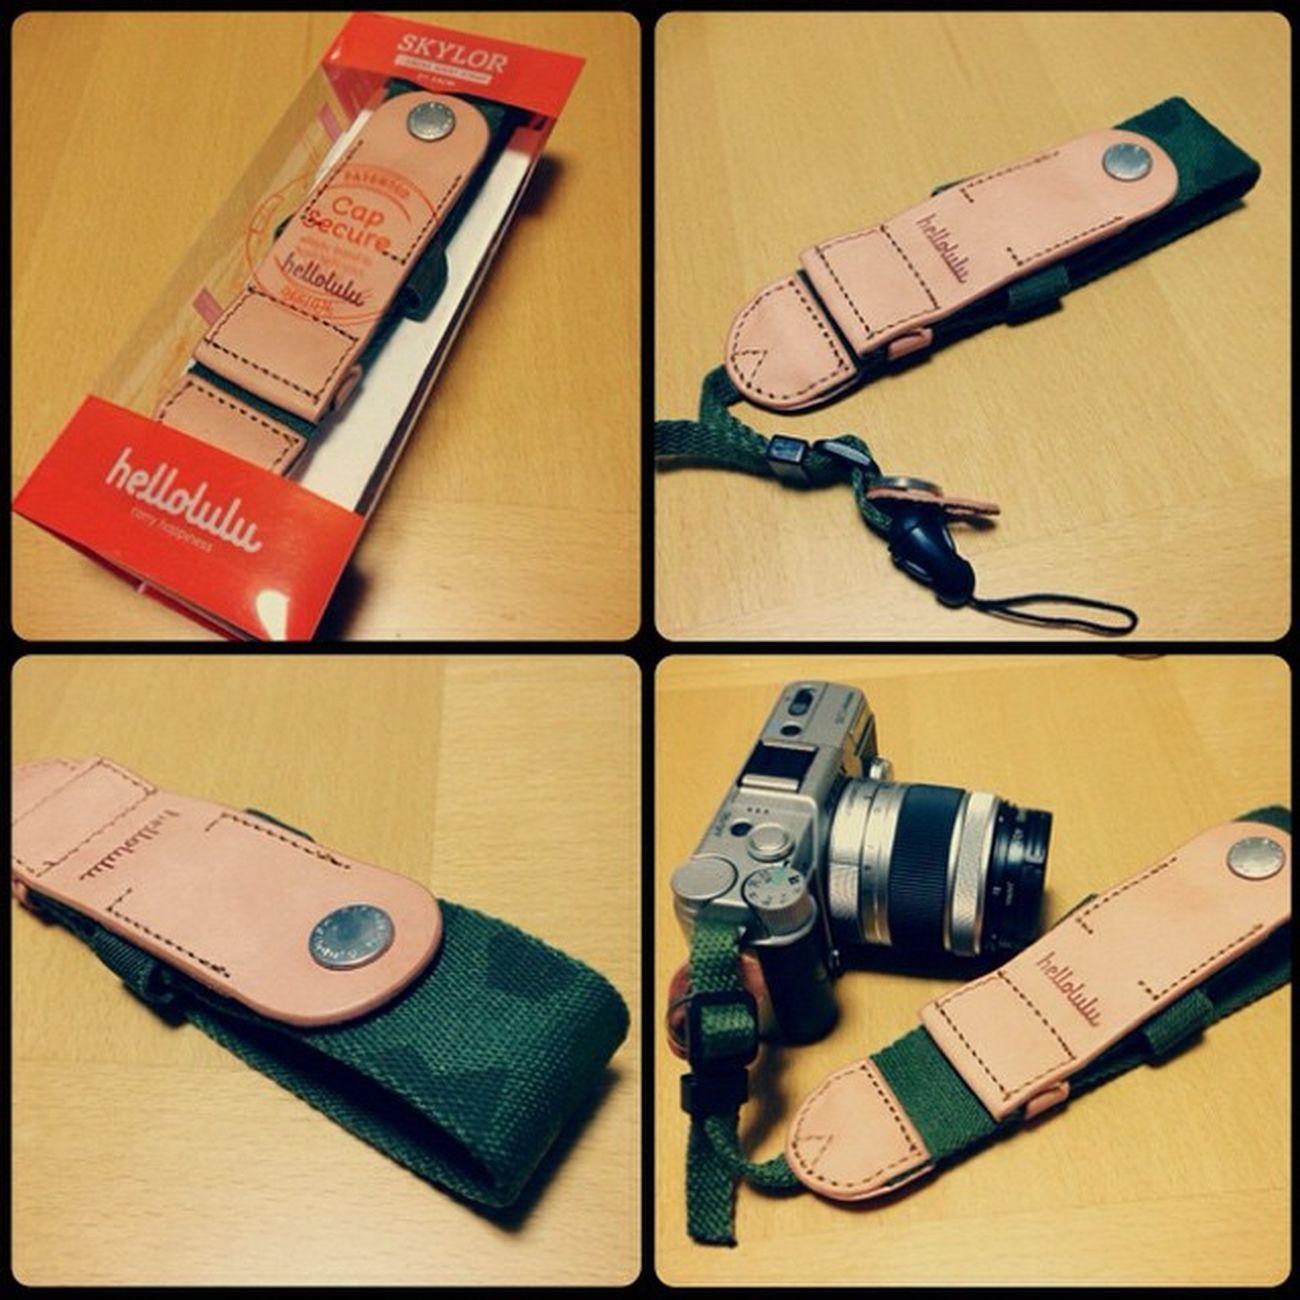 Camera Pentax カメラ Camerastrap Hellolulu PENTAXQ10 カモフラージュ かもふら カメラストラップ Skylor ハロルル カメラ雑貨ドットコム カモフラージュ柄 ハンドストラップ Shutterholic リストストラップ